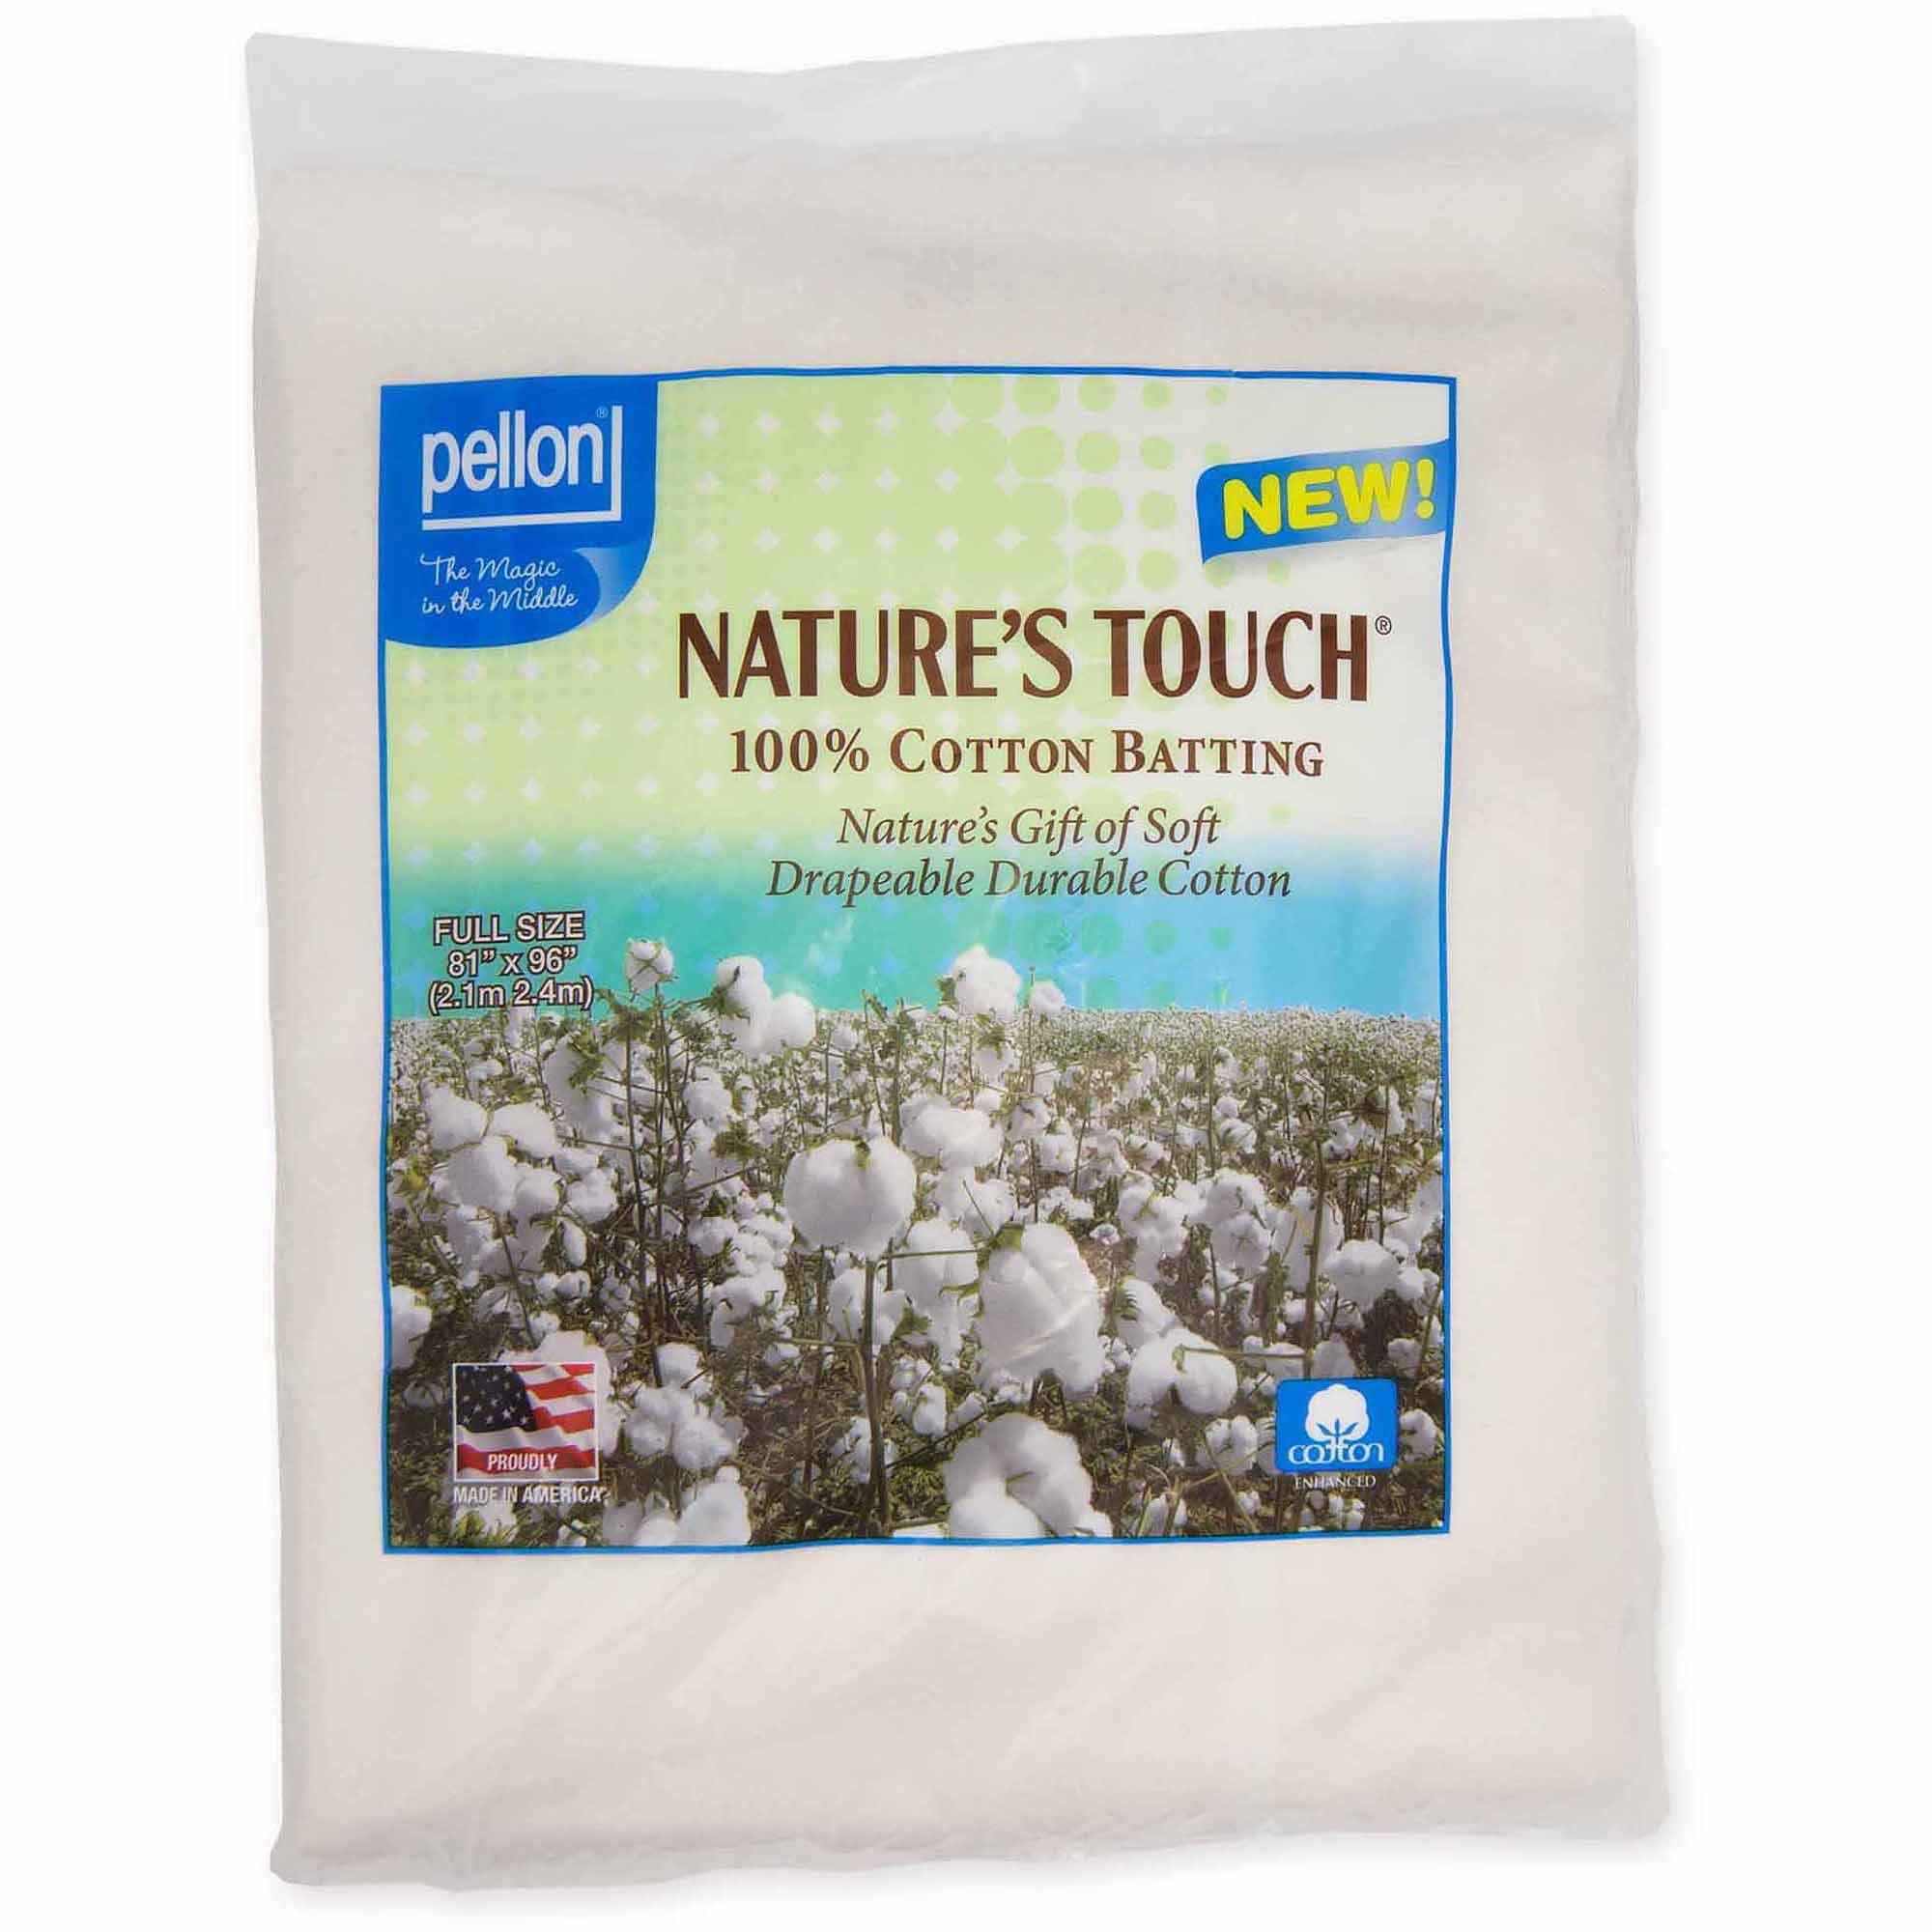 Pellon Nature's Touch 100 Percent Natural Cotton Batting with Scrim